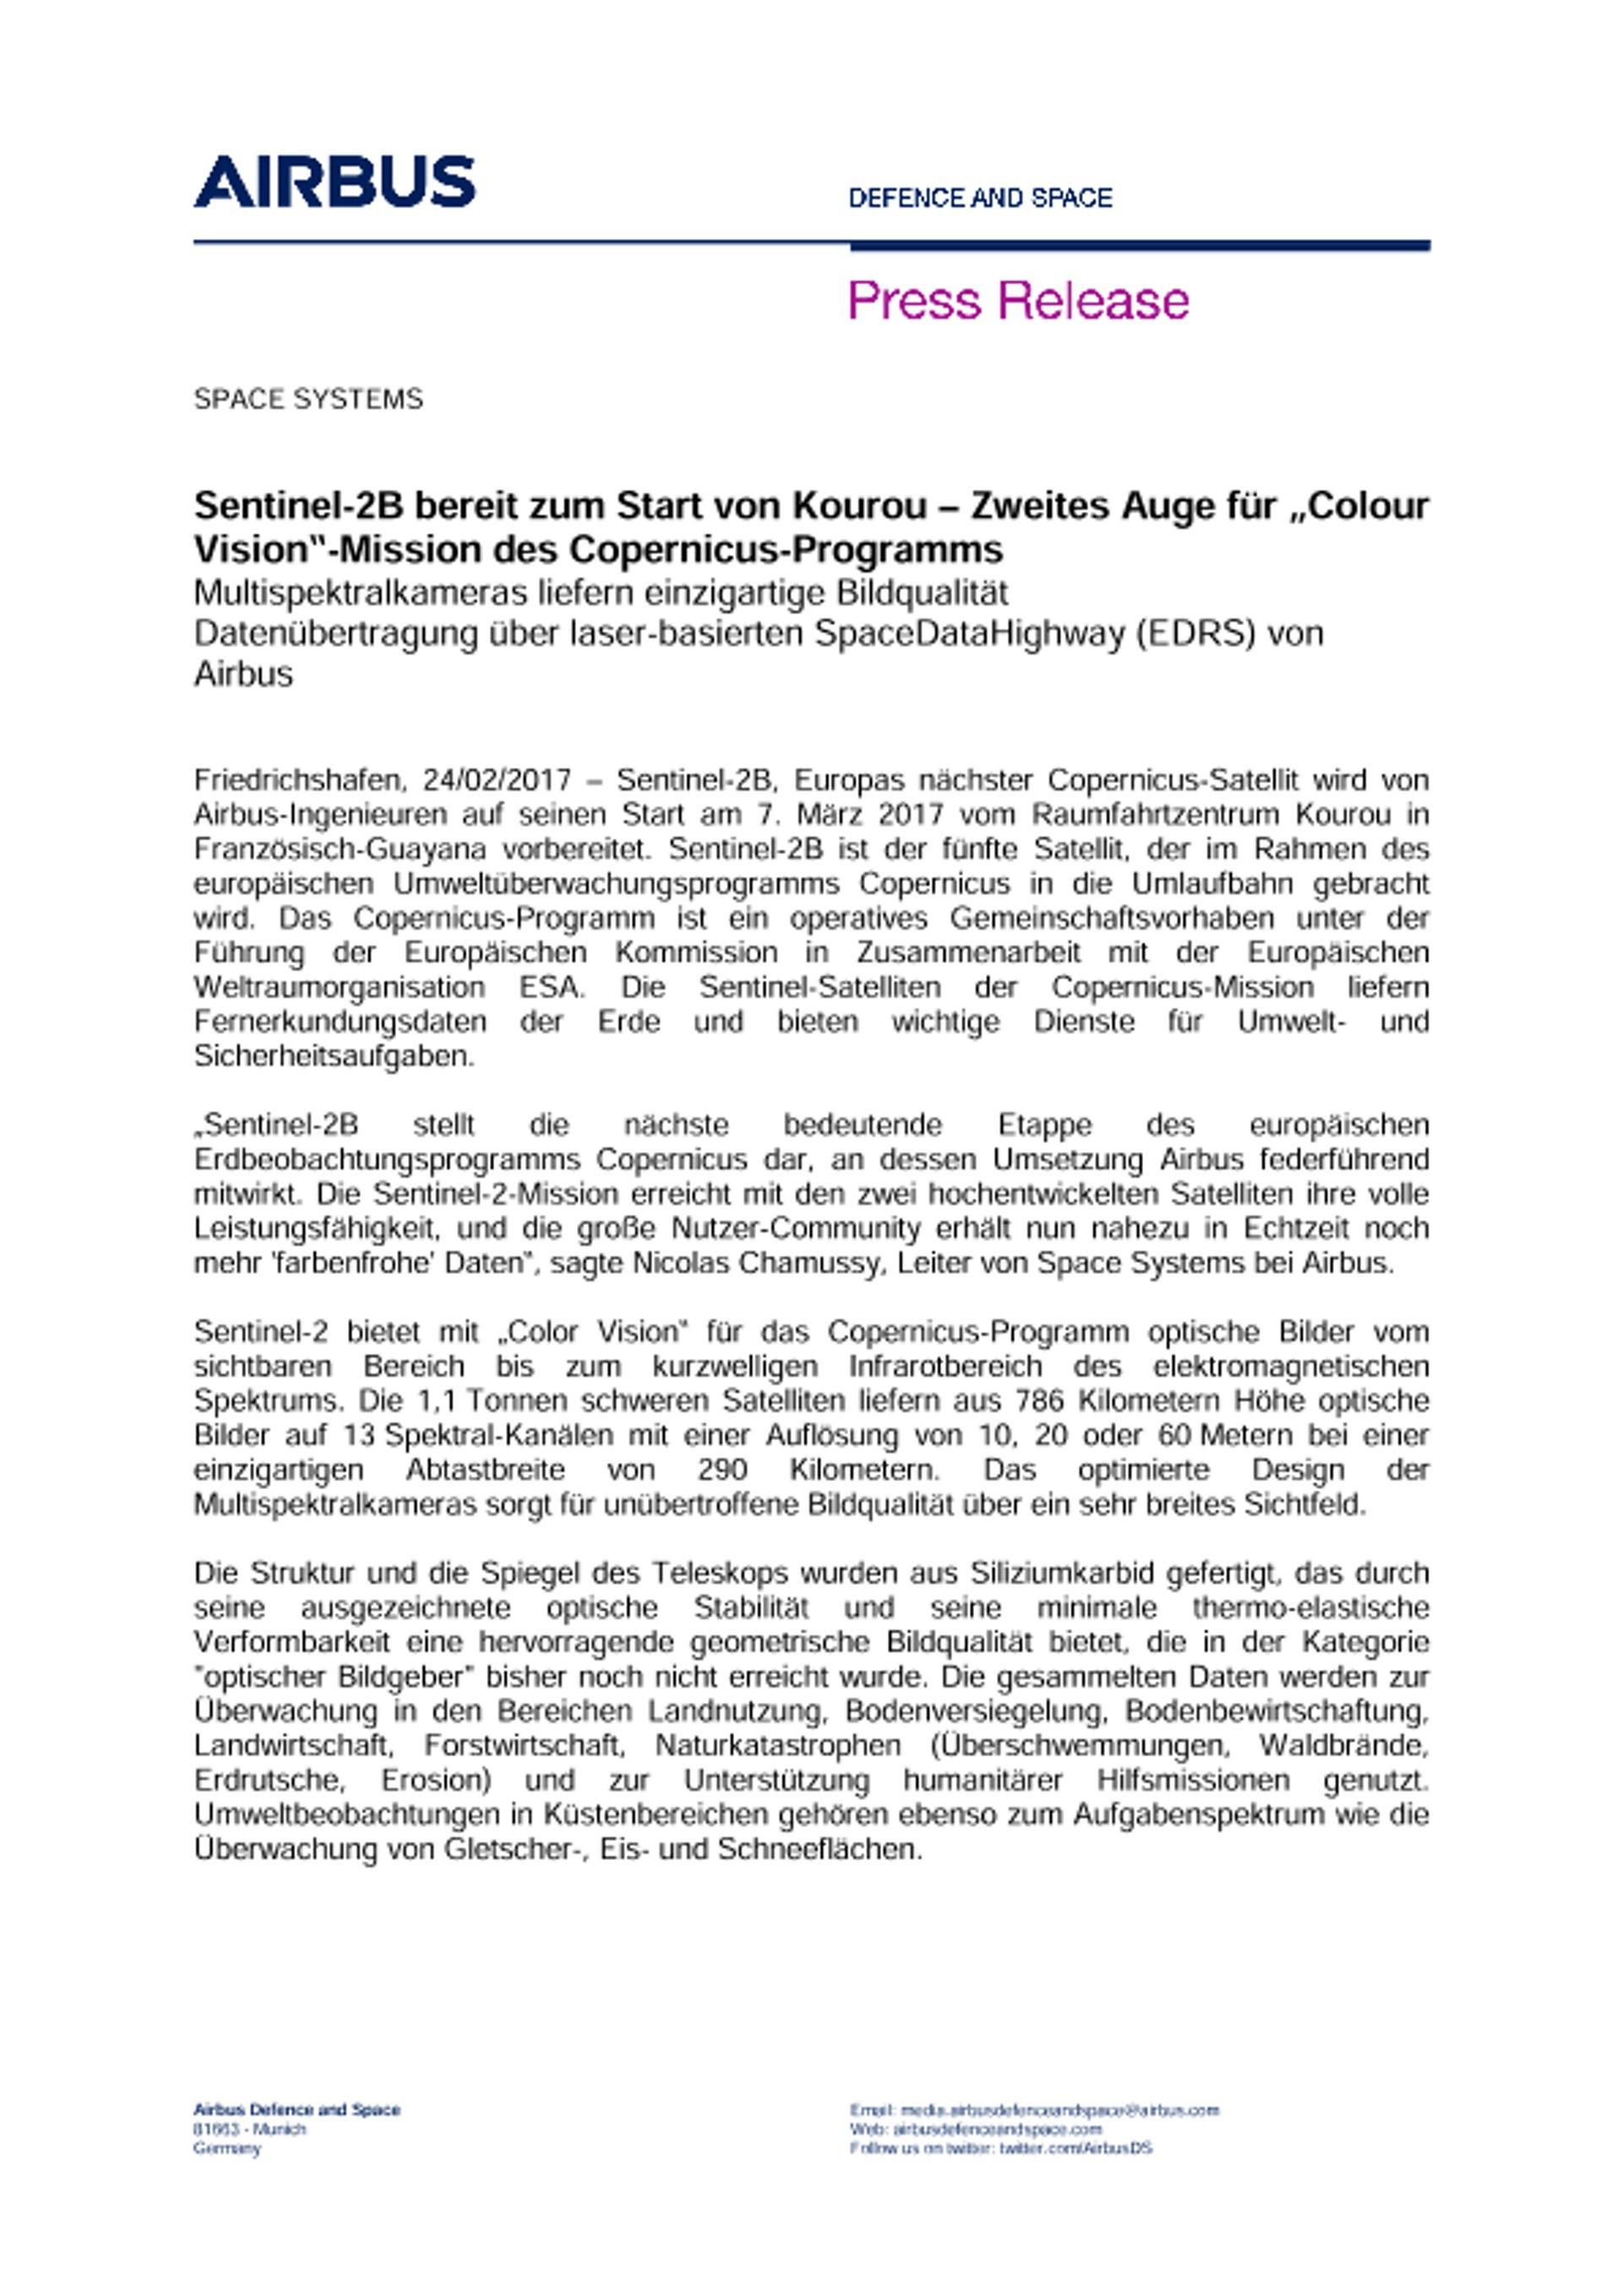 Press Release SPACE SYSTEMS 24022017-DE